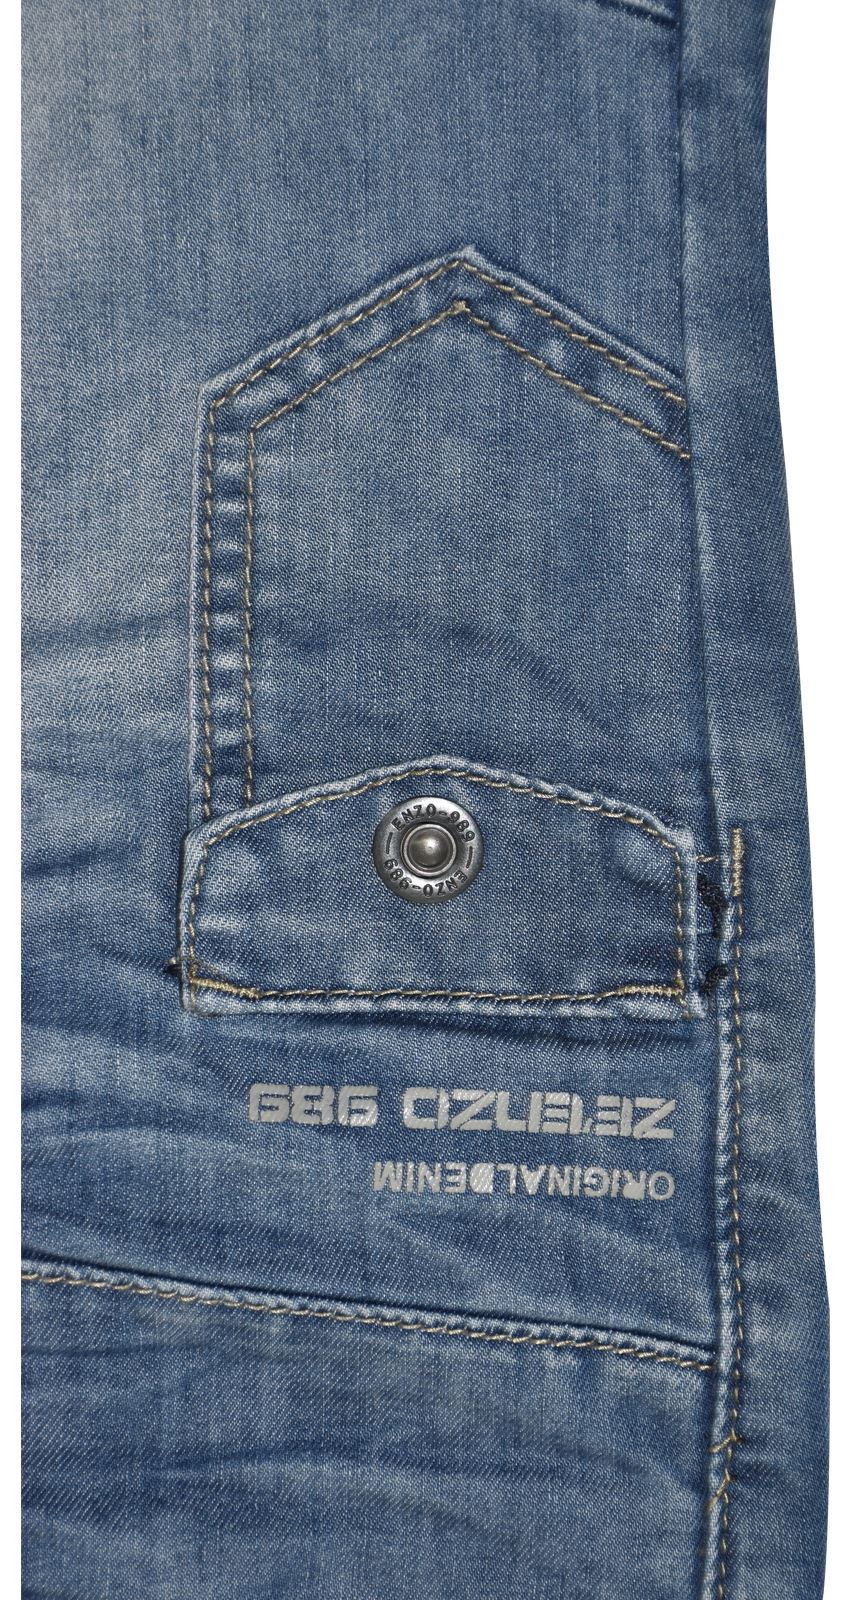 ENZO Jeans Denim Uomo patta con bottoni Regular Fit Pantaloni a Gamba Dritta Pantaloni